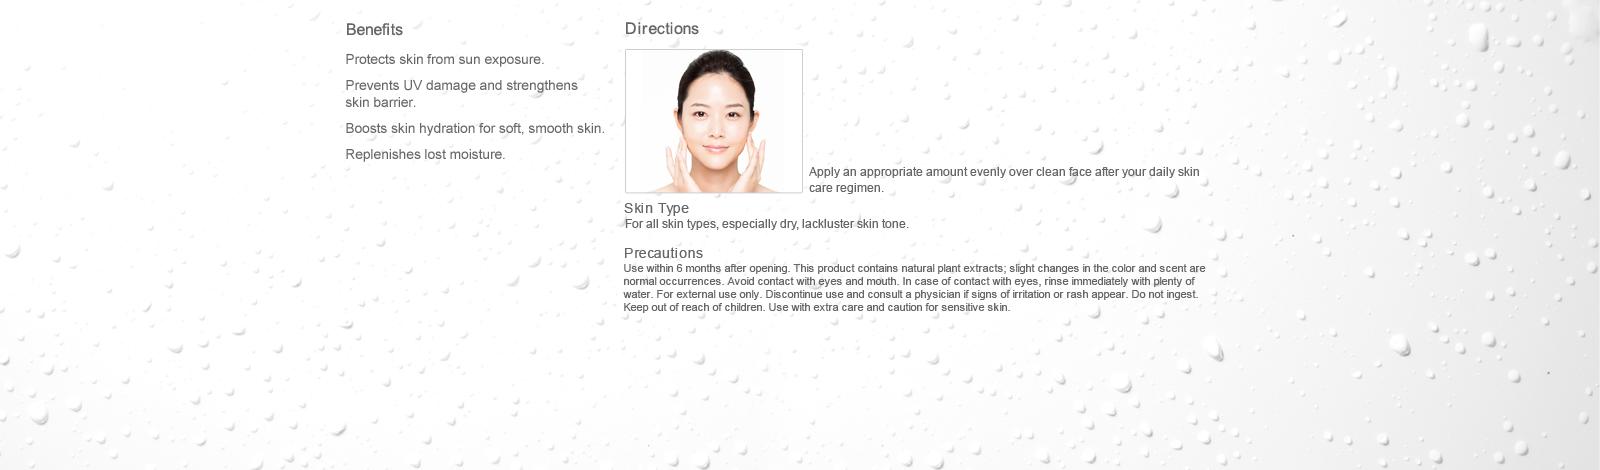 [cml_media_alt id='6464']hyaluronic-acid-hydrating-sunscreen-spf50%c2%b9%c2%b9%c2%b9%c2%b9-04[/cml_media_alt]